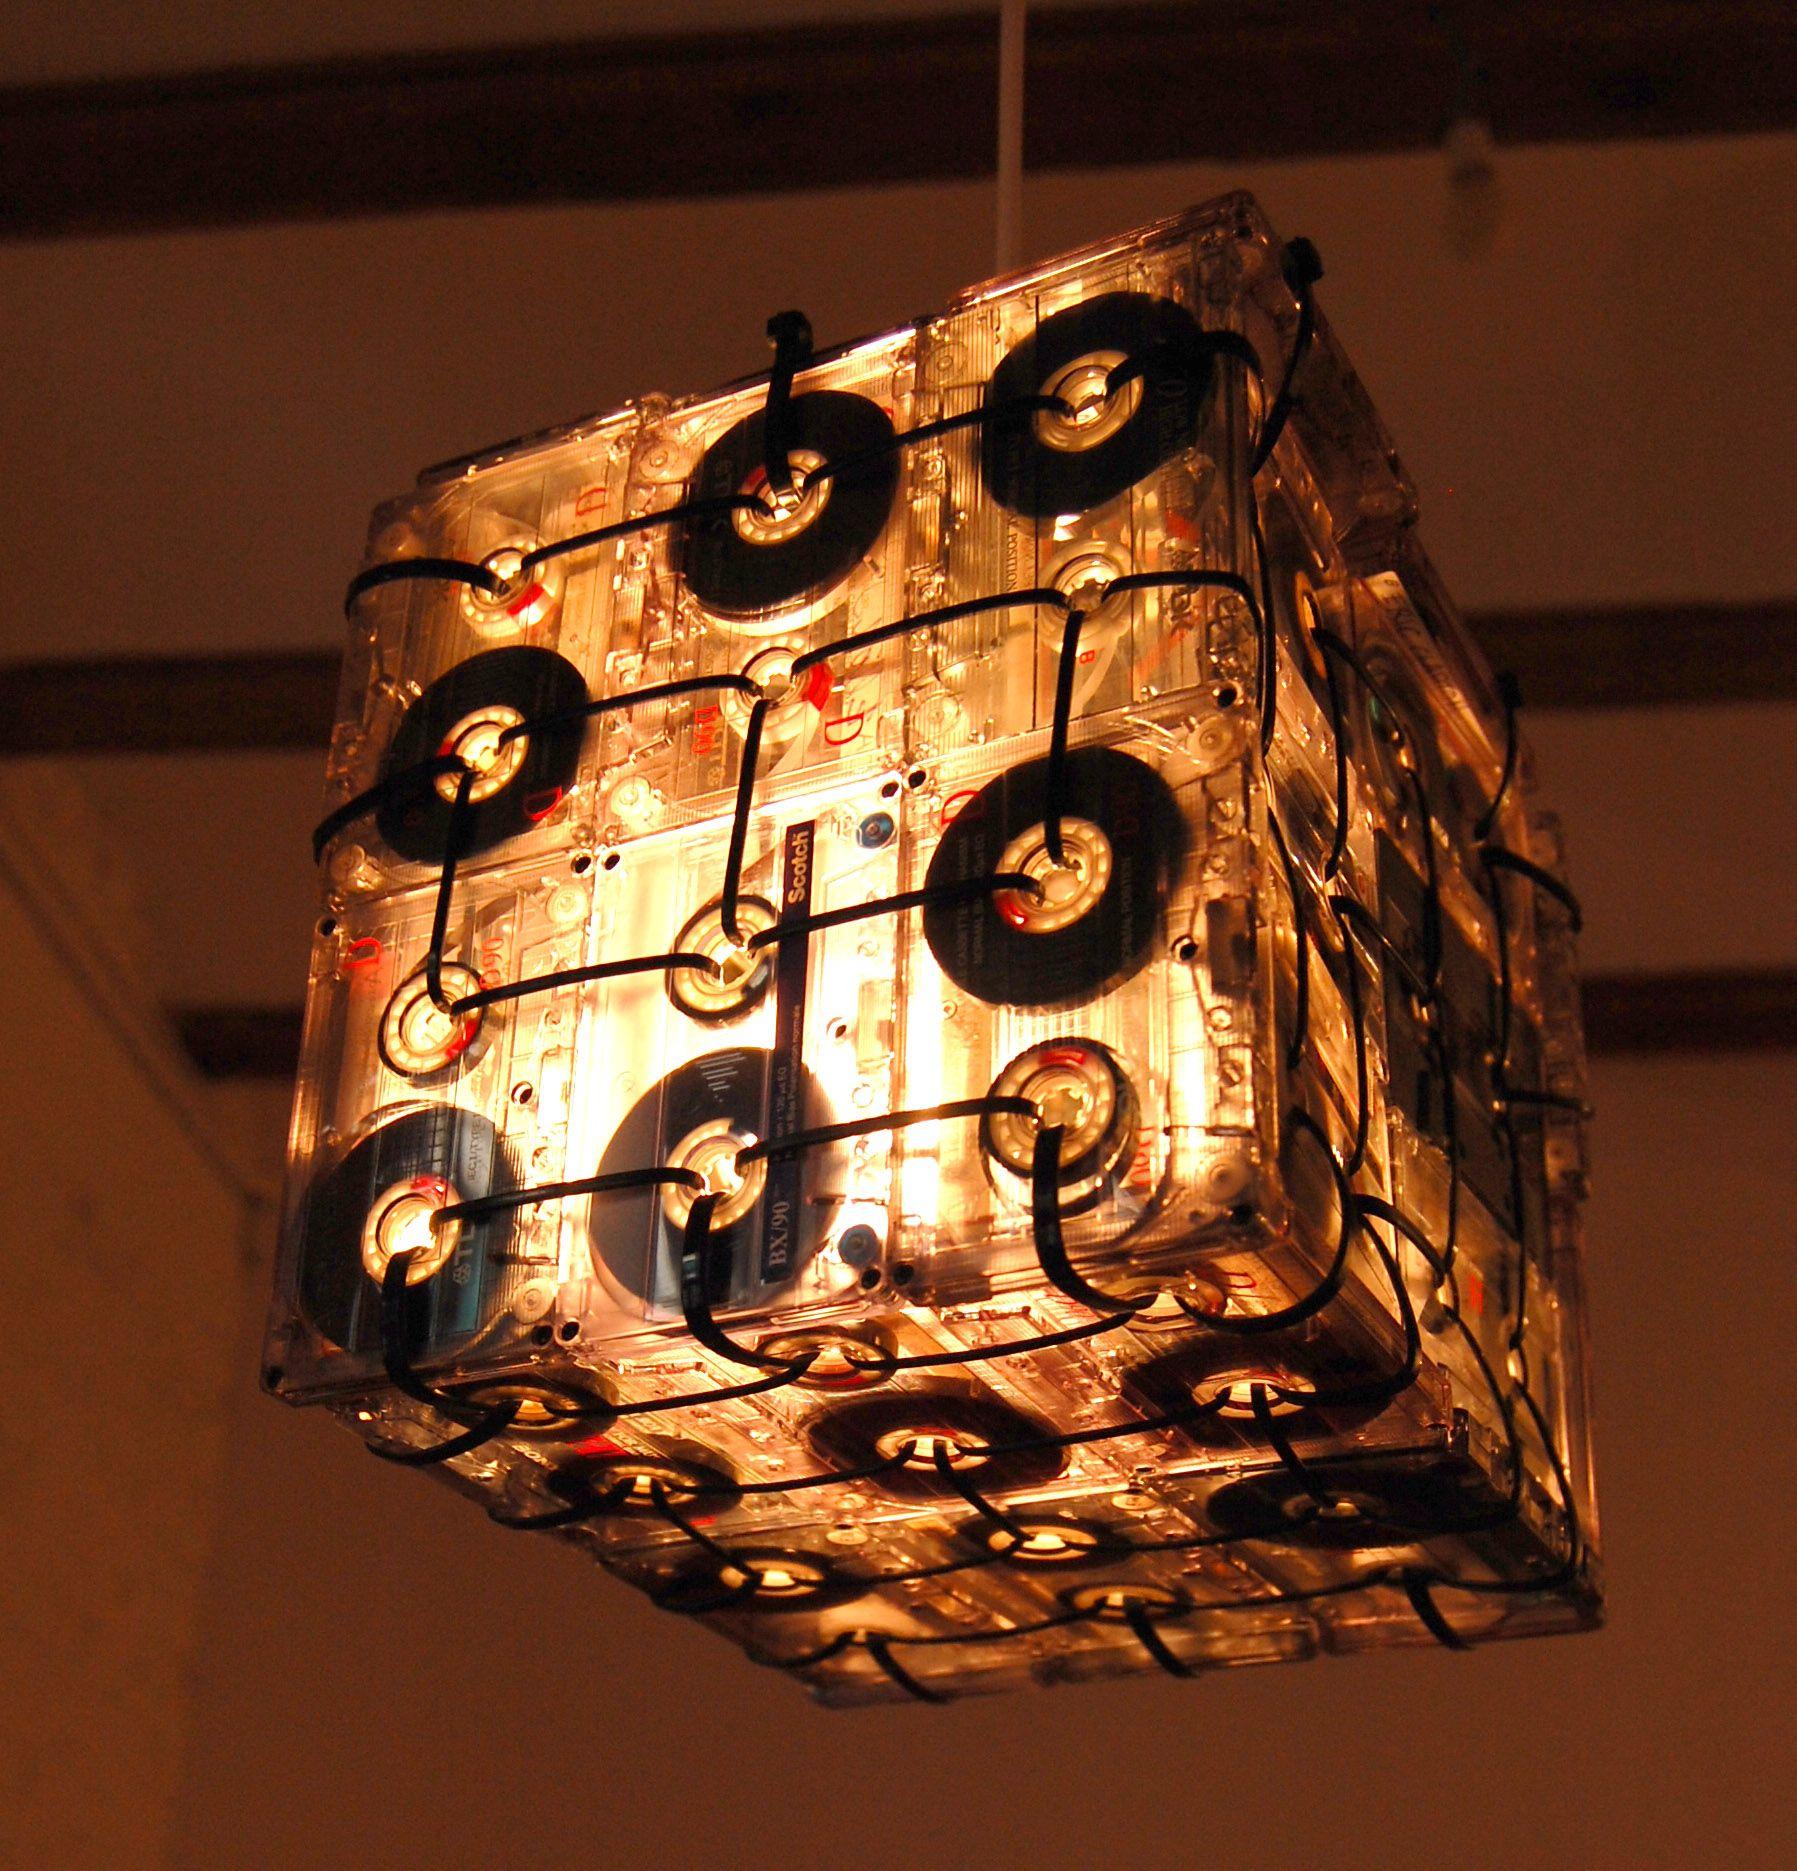 Unique Hanging Lamps unique homemade lamps design ideas : awesome cassette tapes